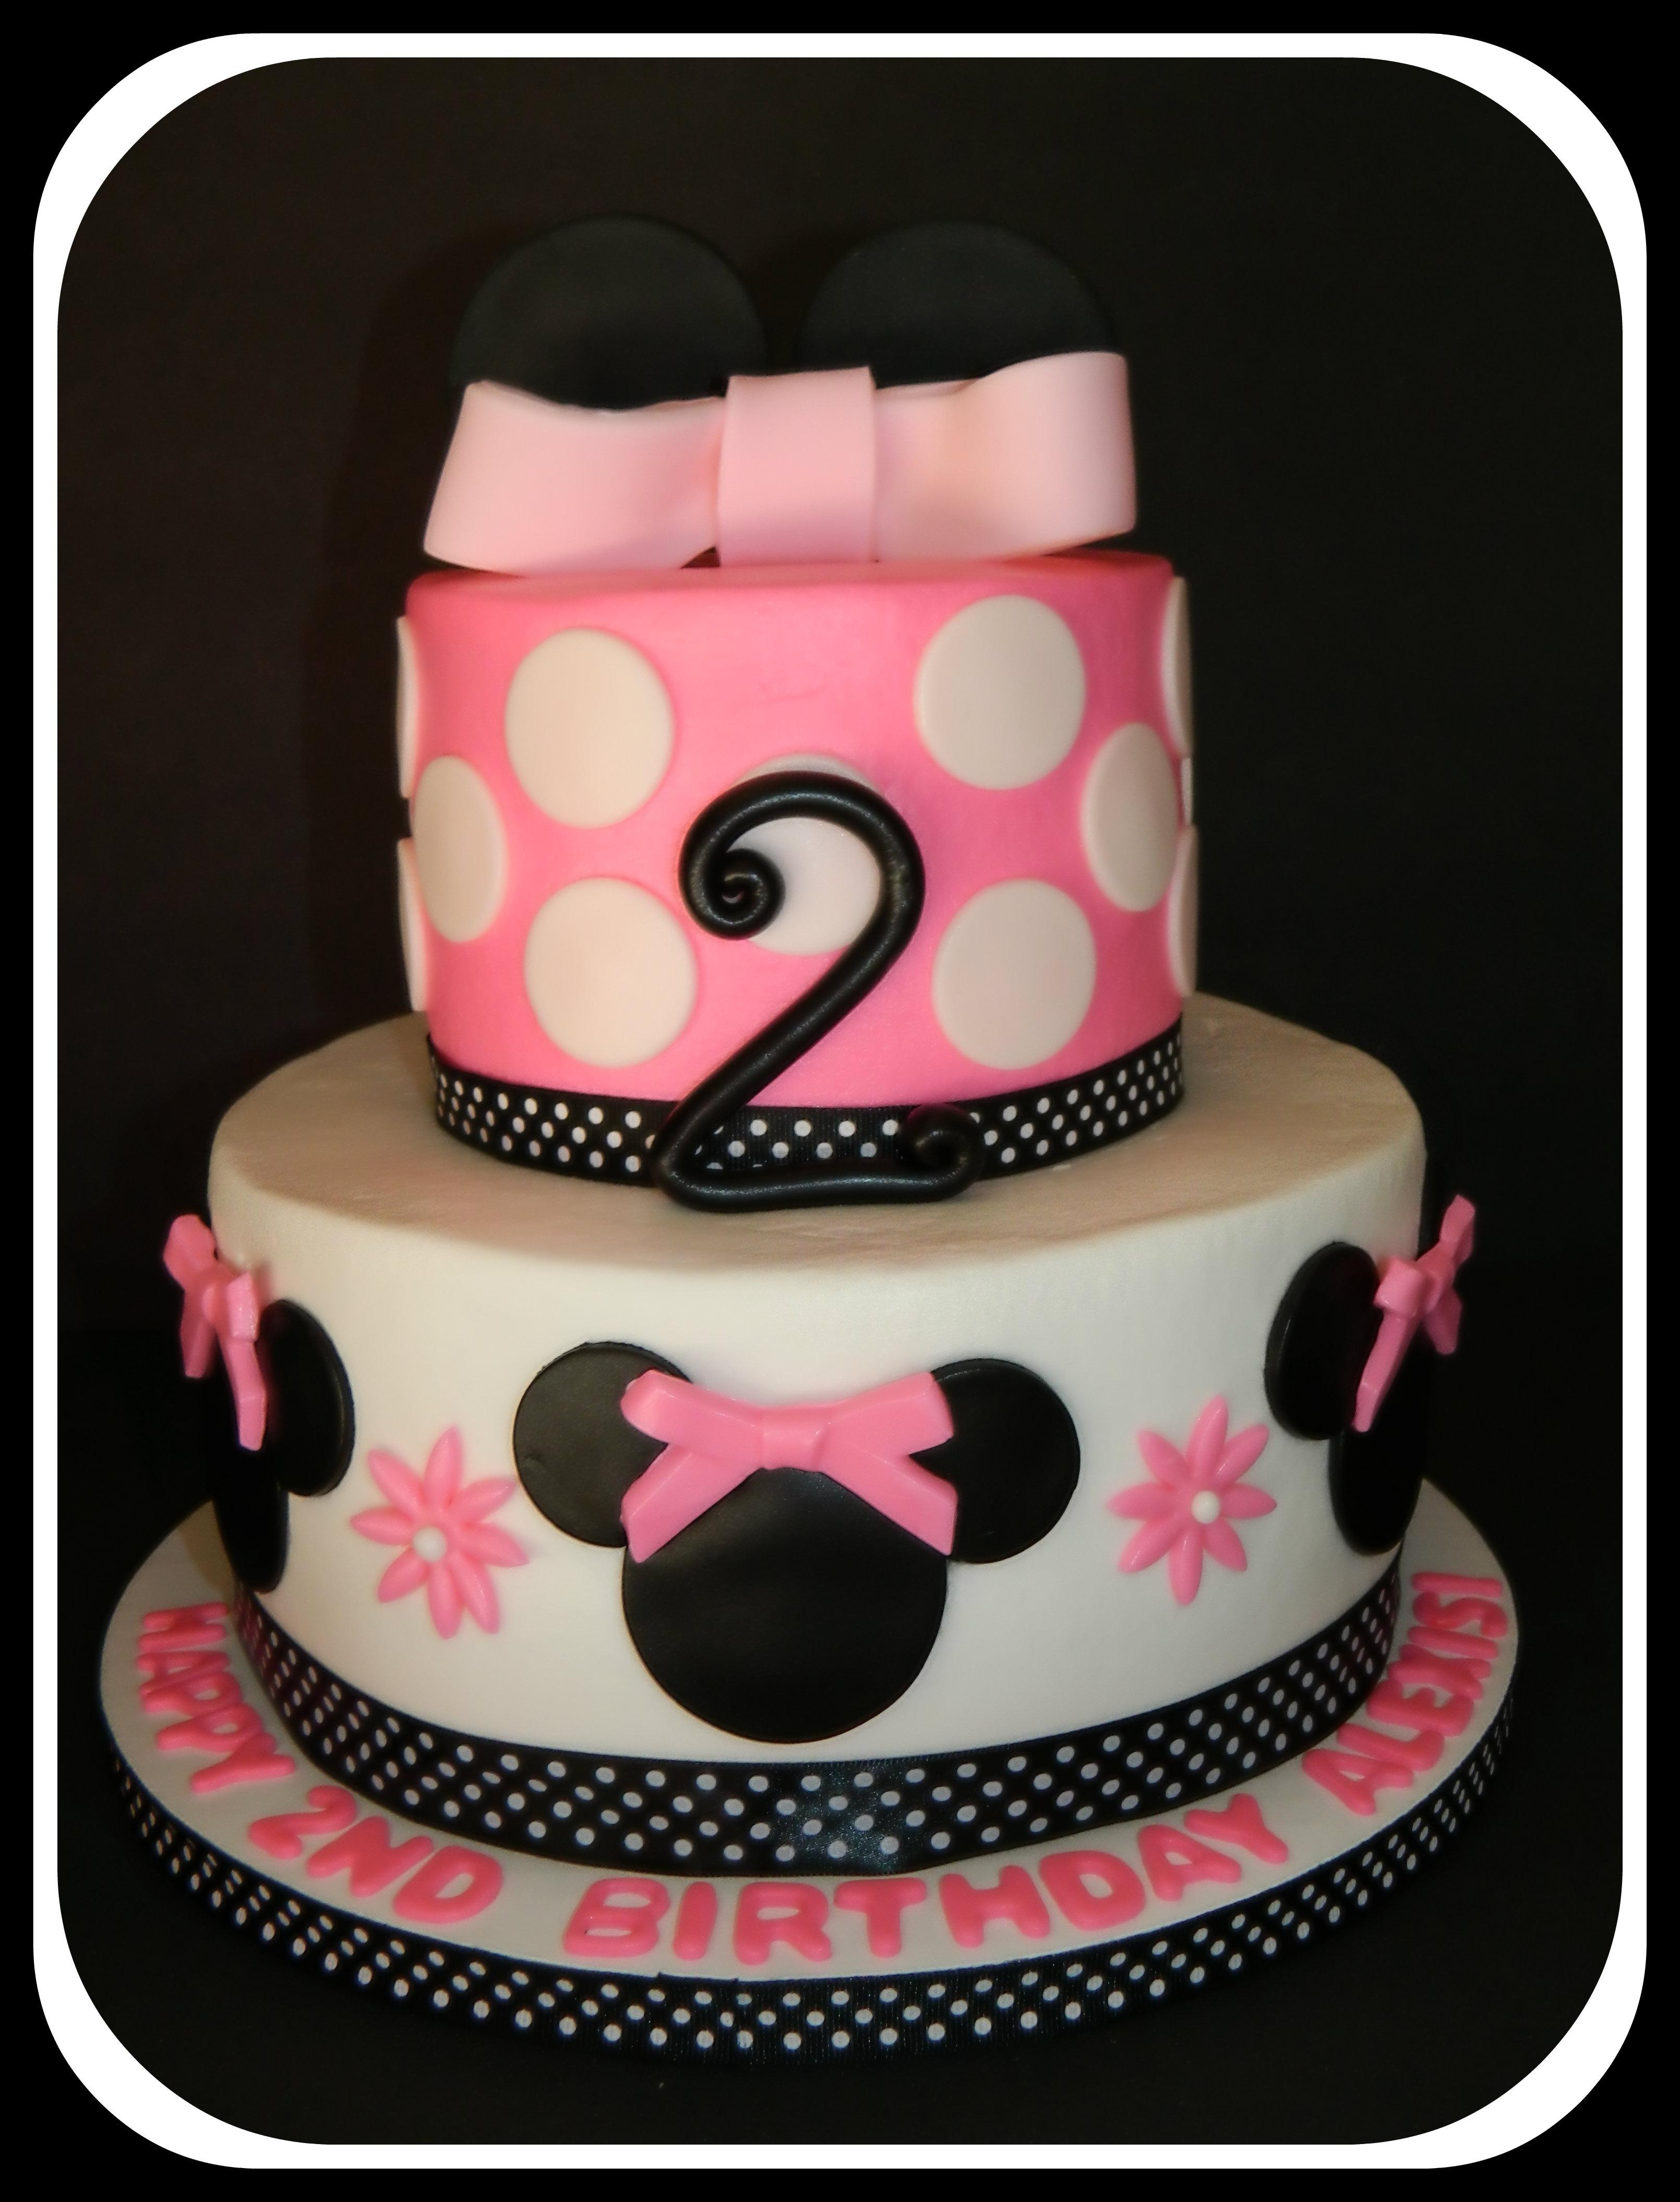 My Favorite Birthday Cake So Far I Love This Cute Teapot Cake - Favorite birthday cake